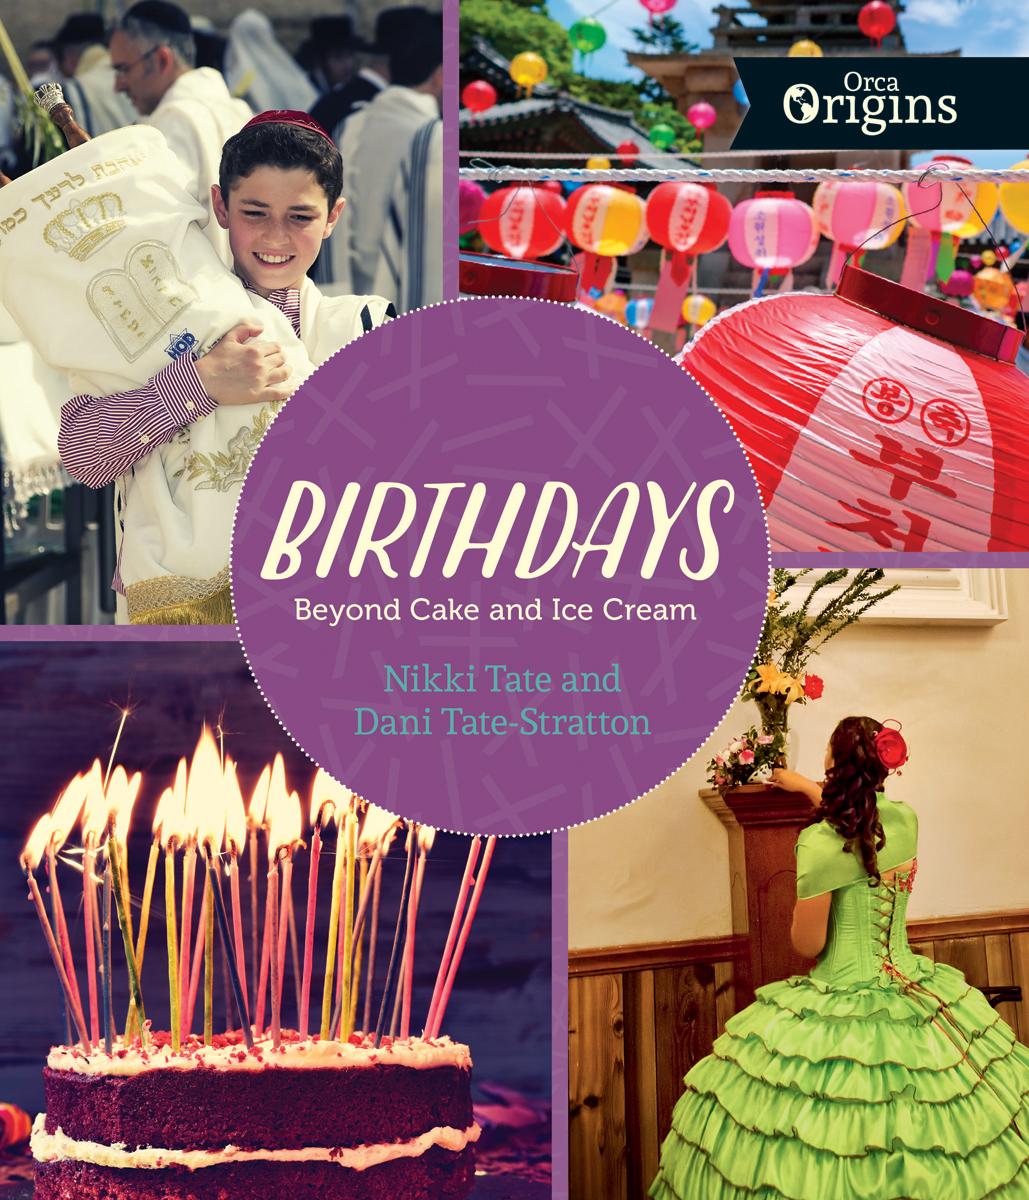 Birthdays Beyond Cake and Ice Cream